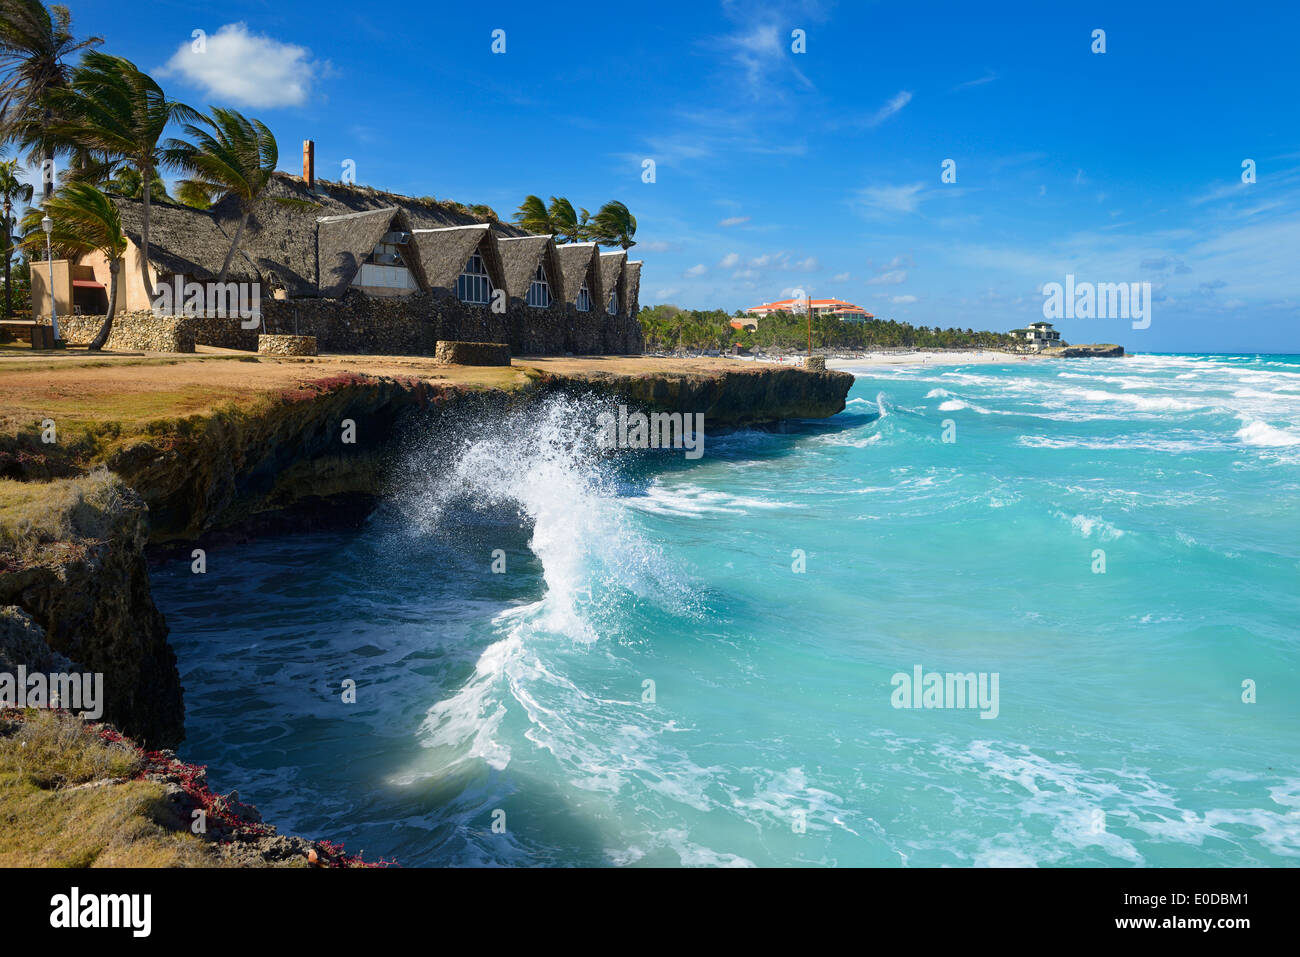 Wave rebounding off lava rock shore causing splash in high wind at Varadero Cuba beach resort - Stock Image